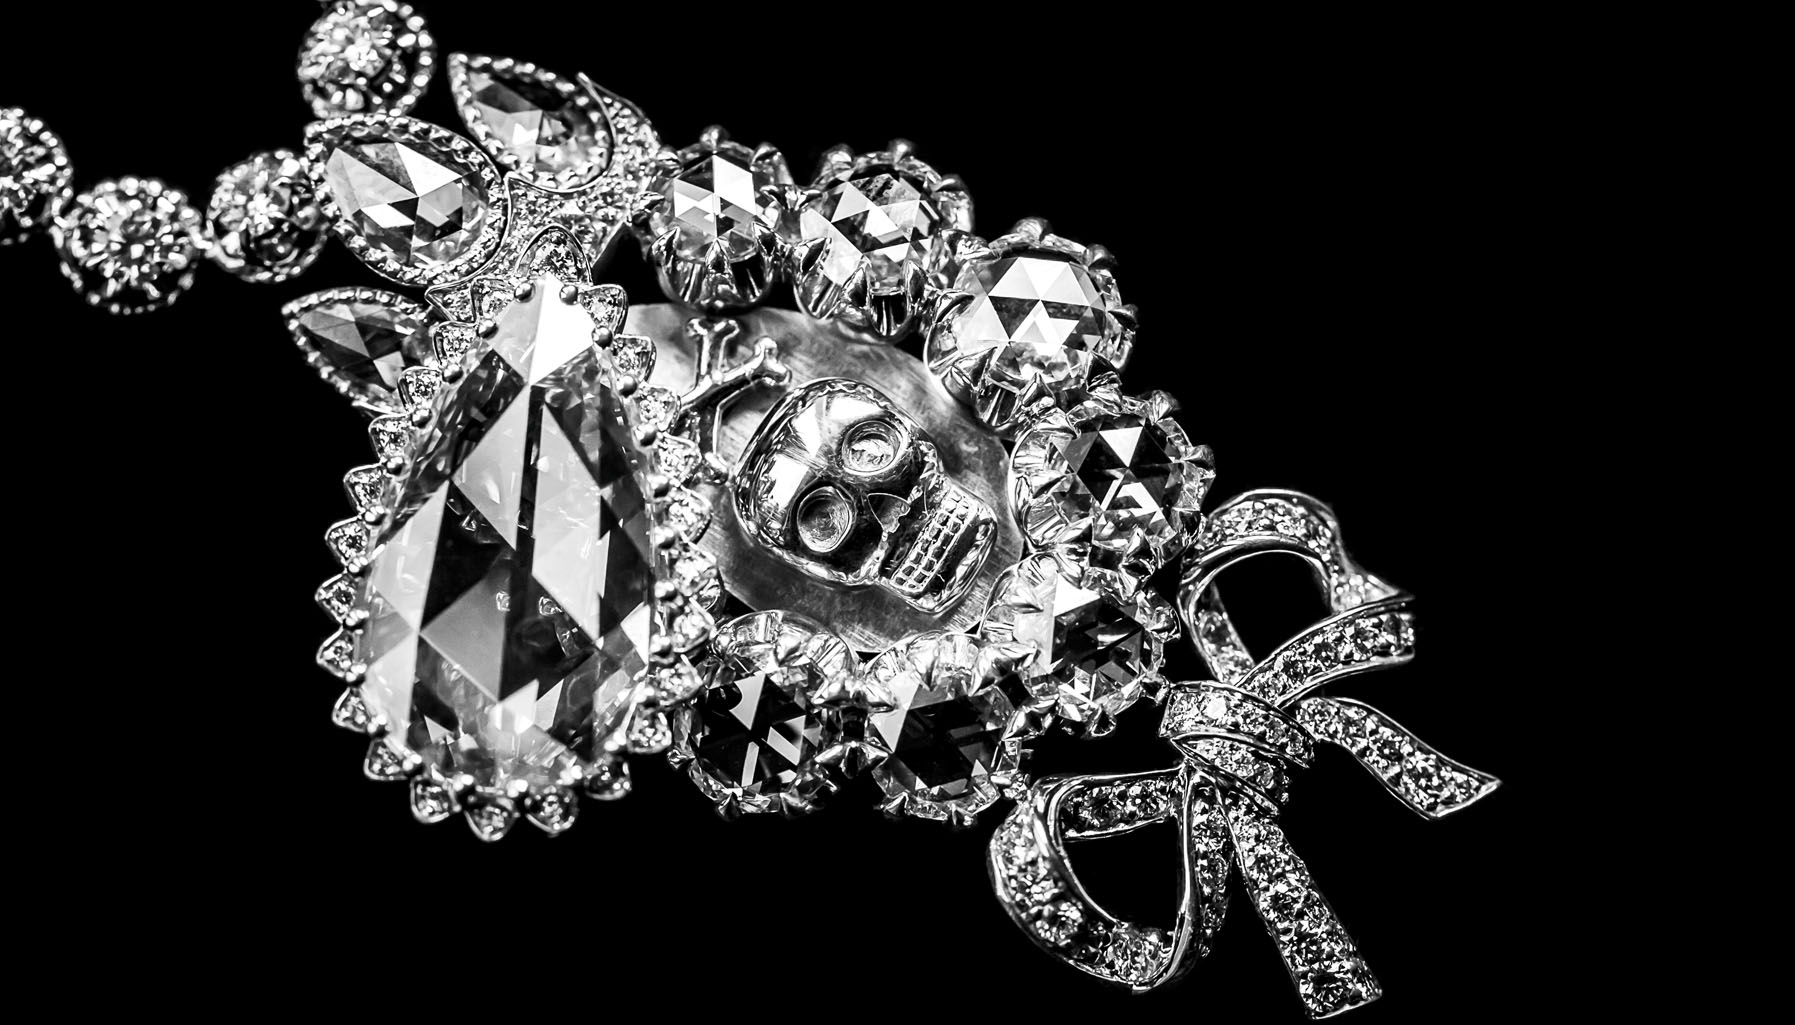 Dior Pieces Secretes collection